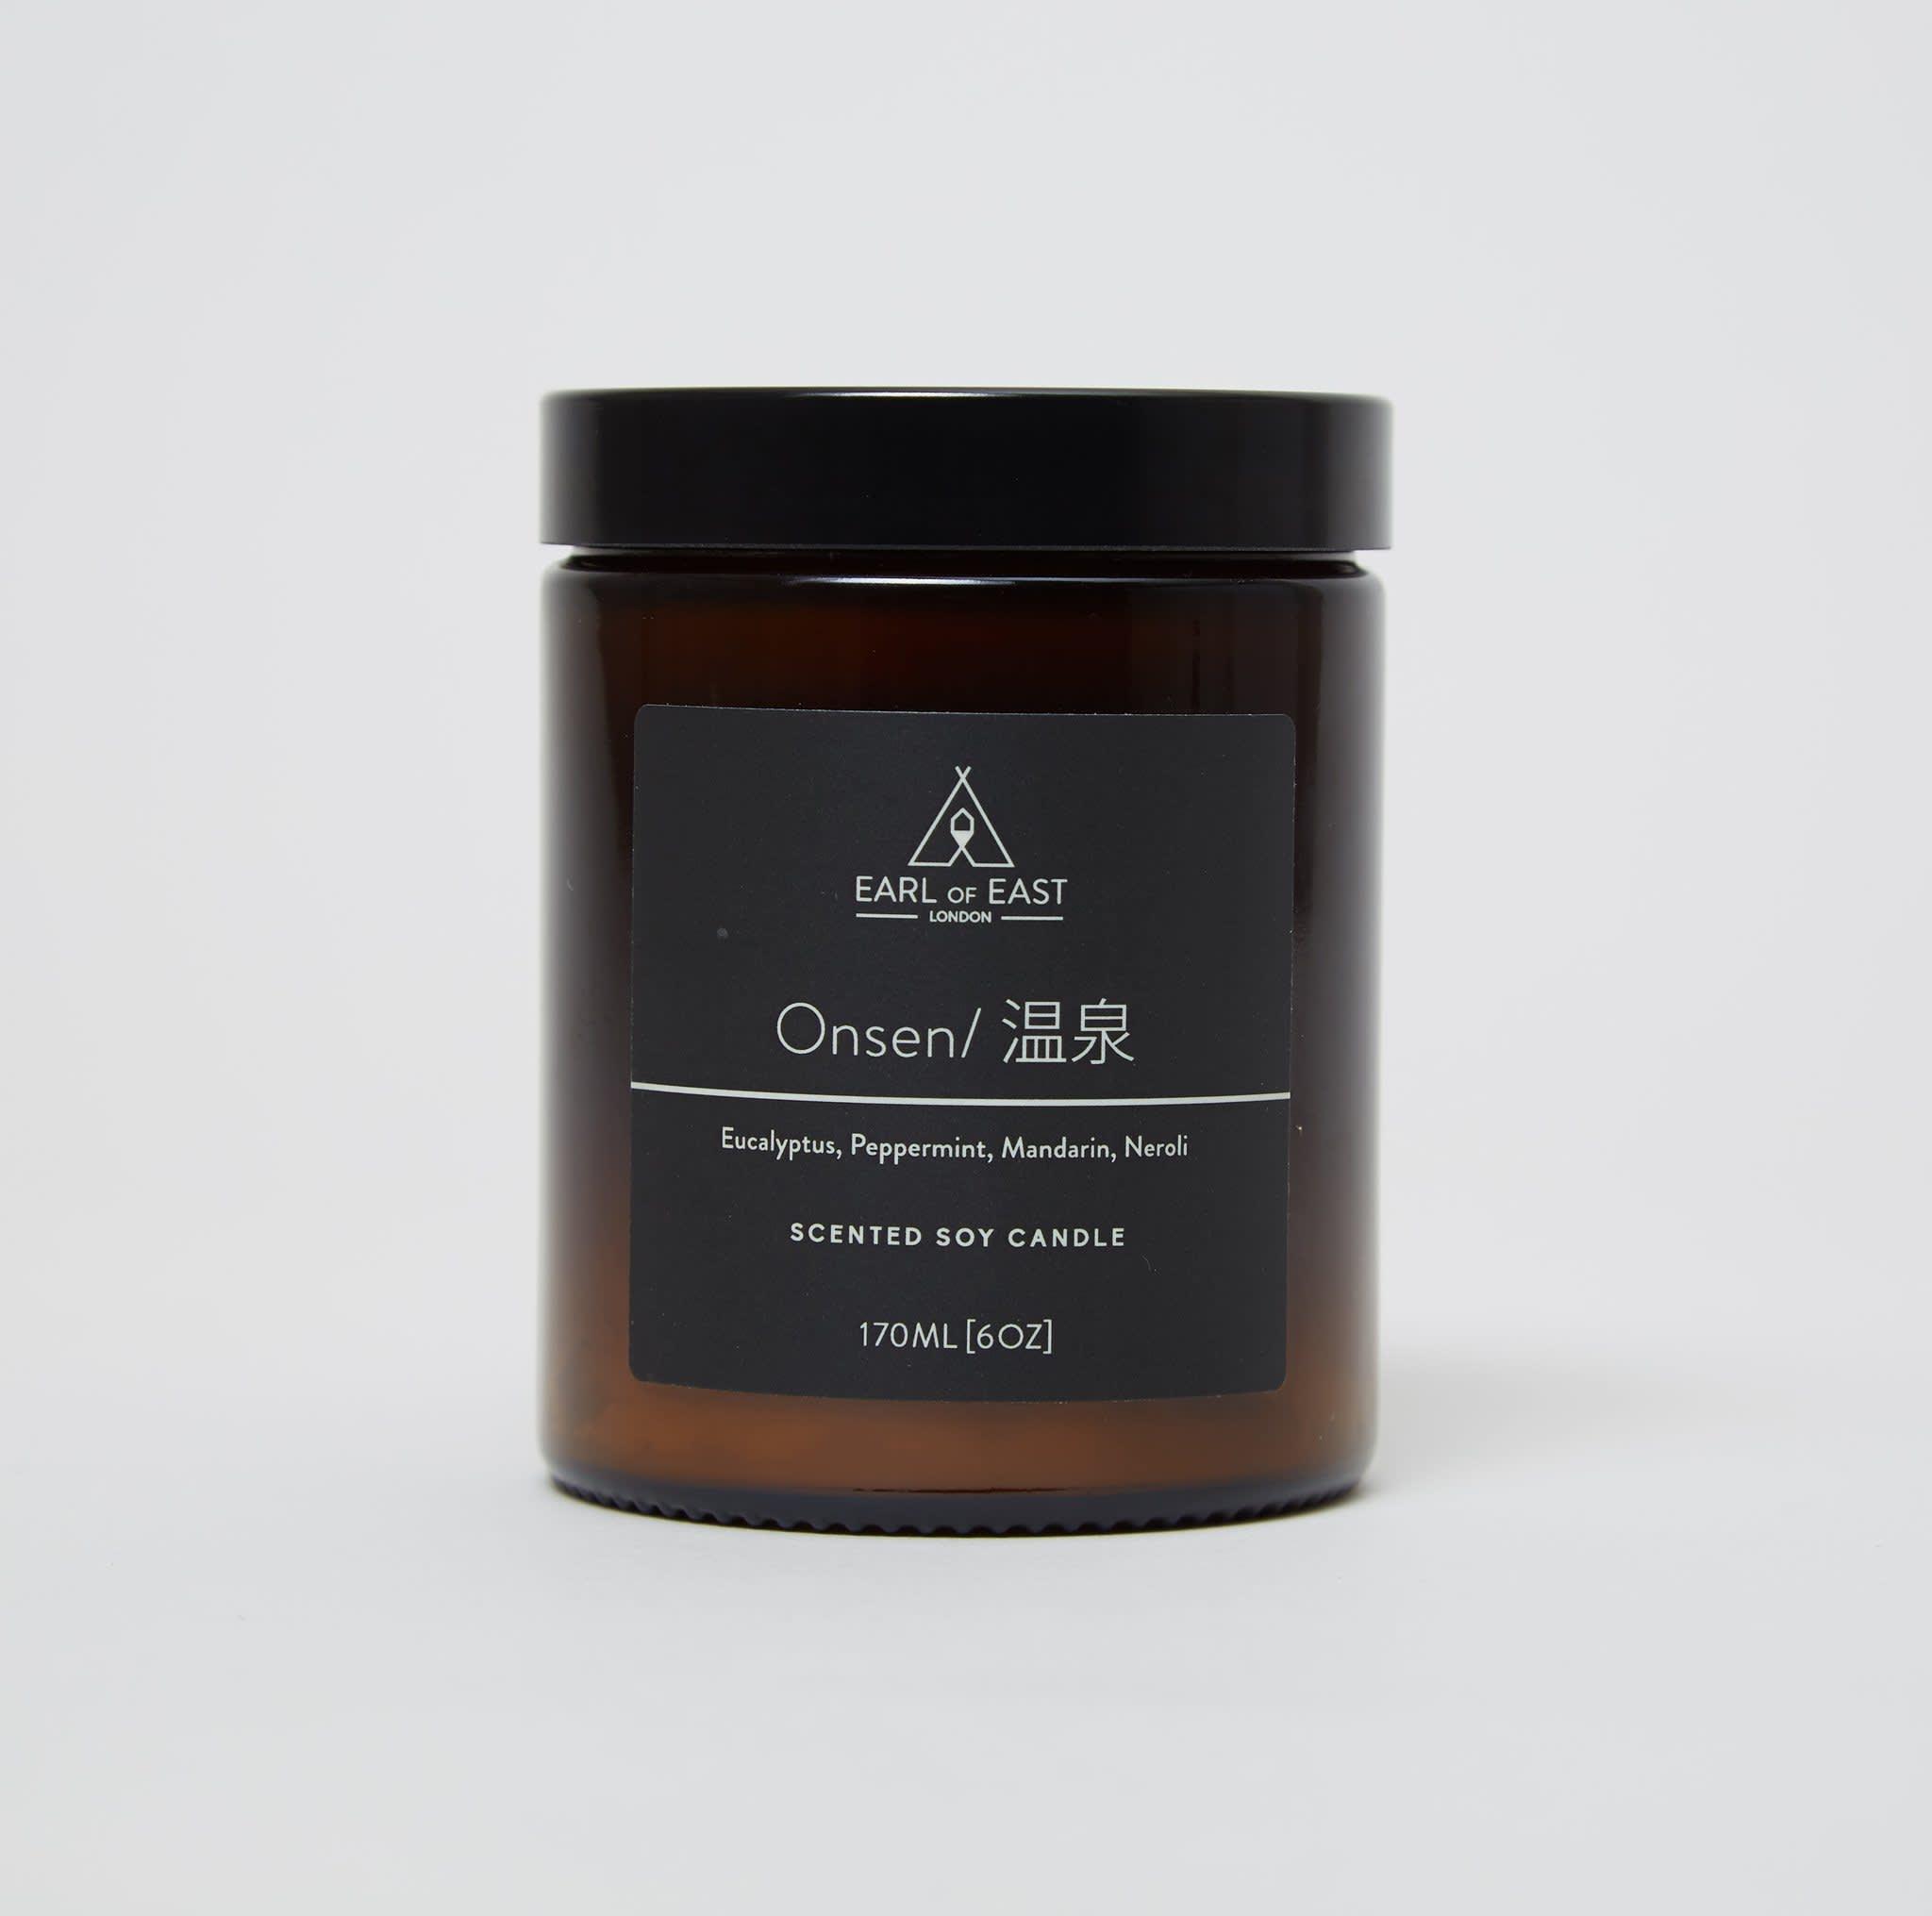 Earl of East London Medium Onsen Candle